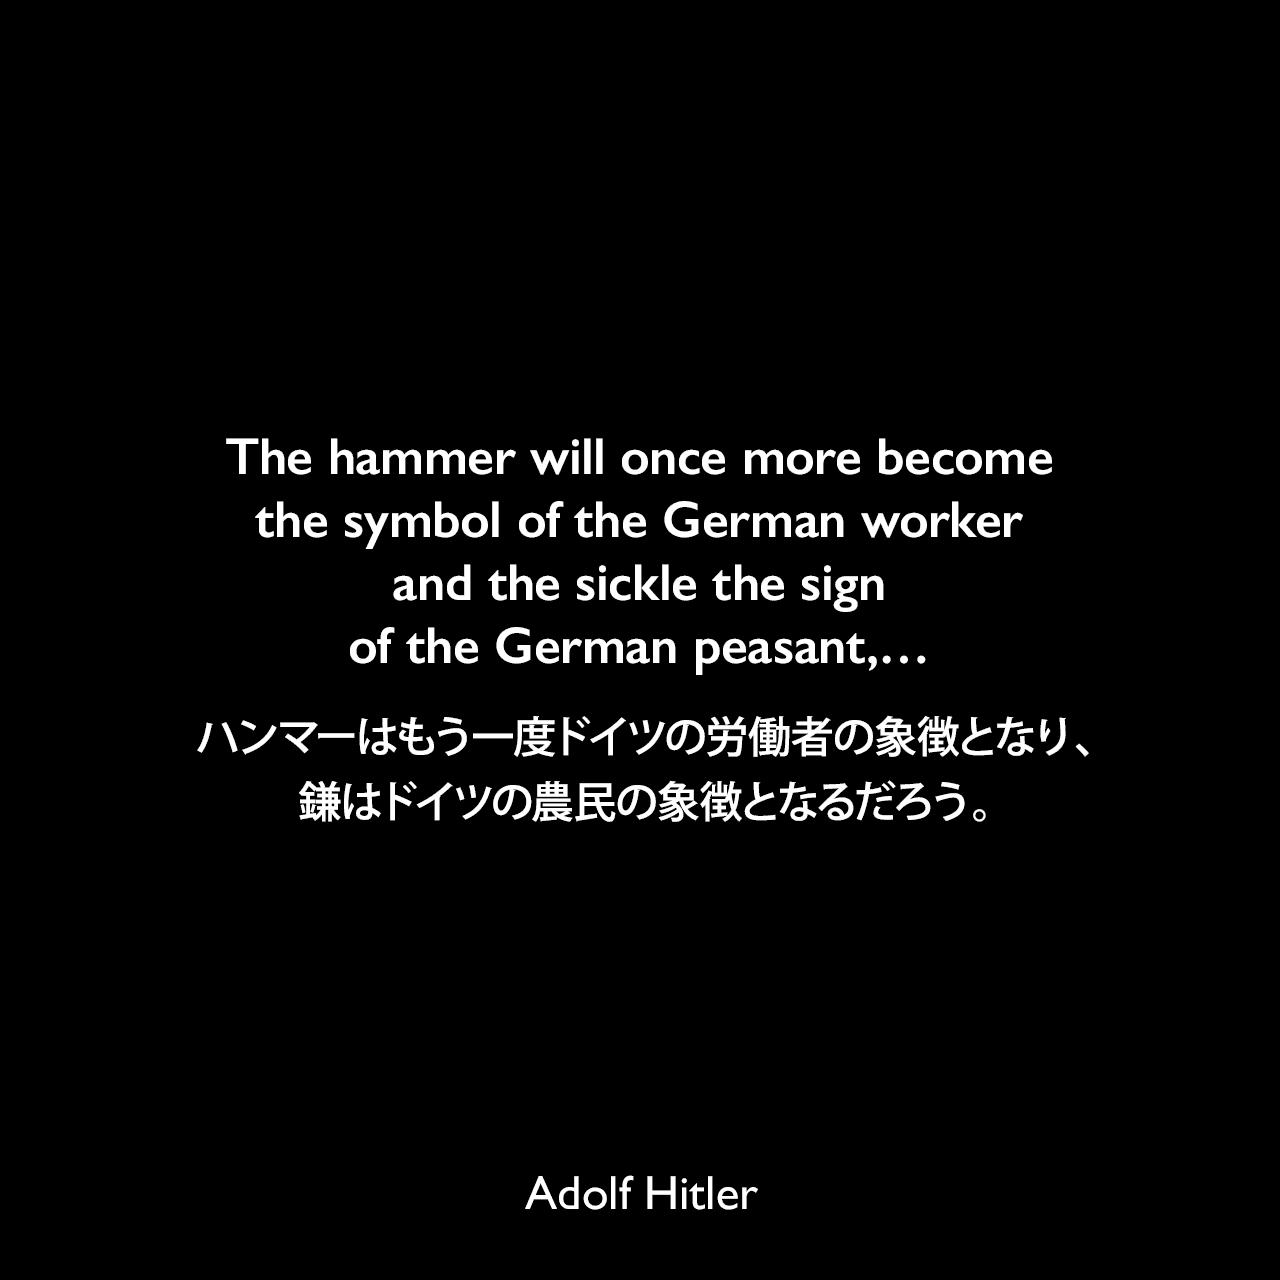 The hammer will once more become the symbol of the German worker and the sickle the sign of the German peasant,…ハンマーはもう一度ドイツの労働者の象徴となり、鎌はドイツの農民の象徴となるだろう。- 1934年5月1日ベルリン、テンペルホーフ飛行場でのメーデー演説よりAdolf Hitler